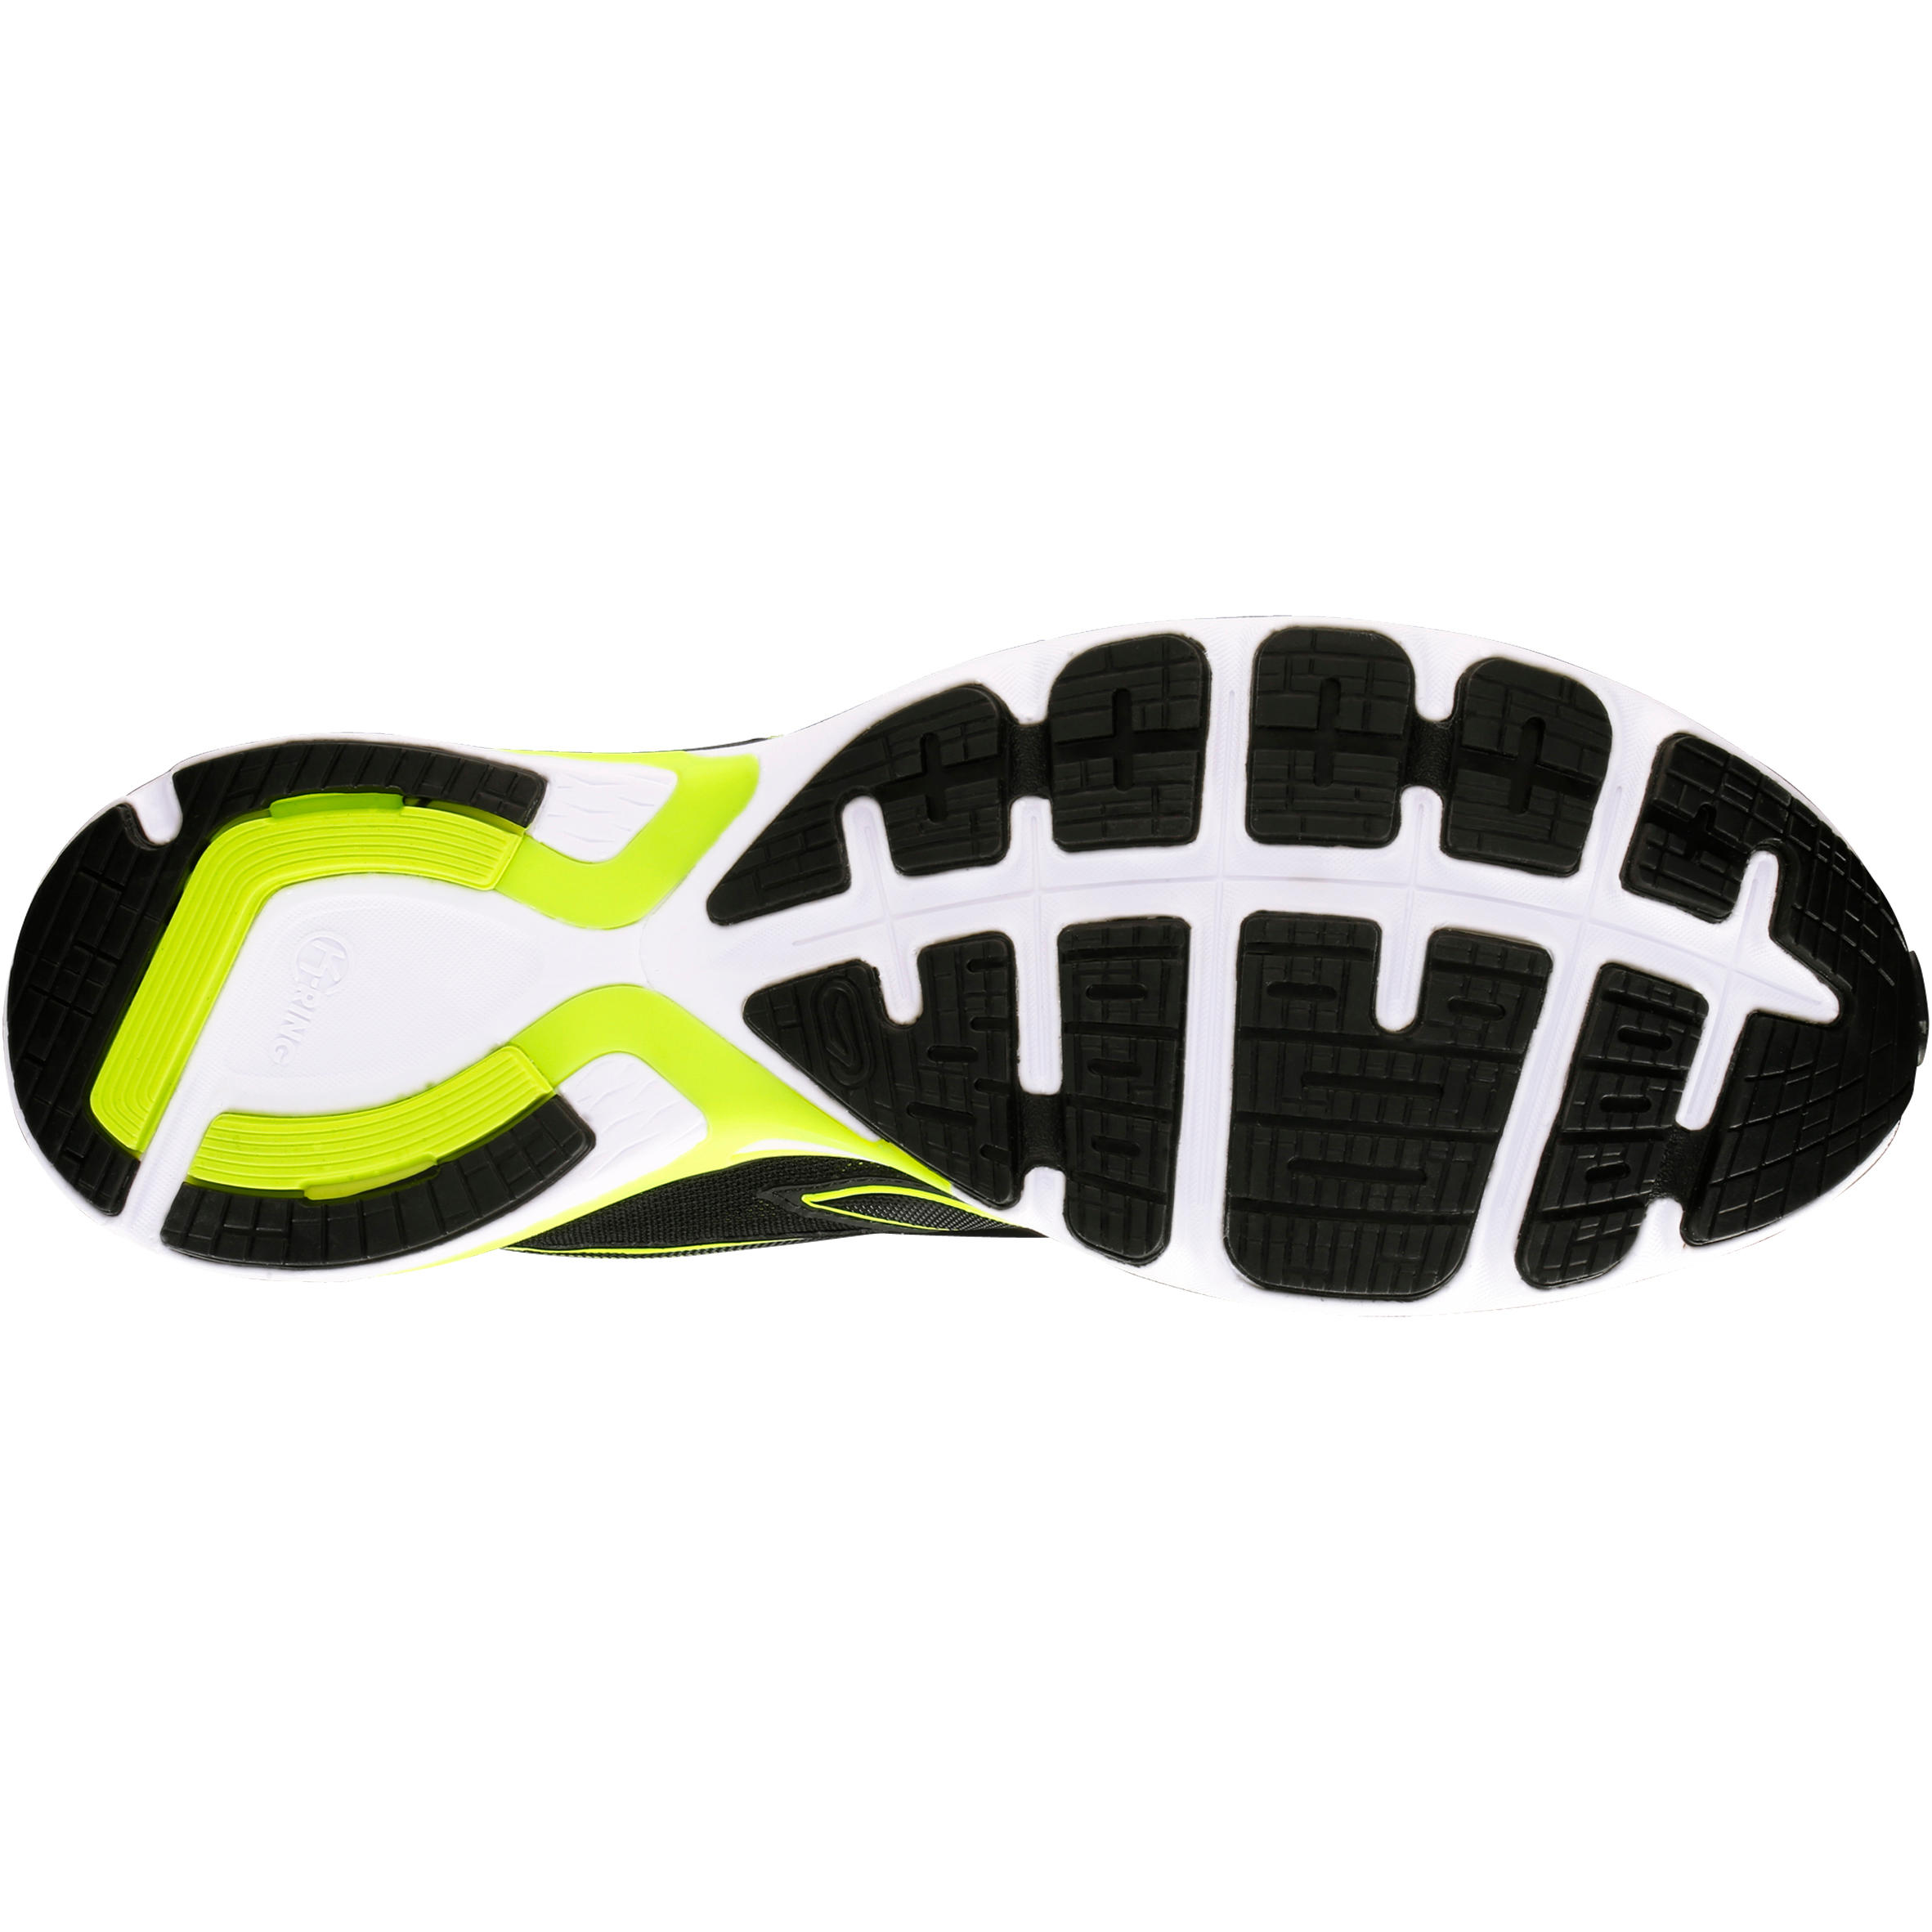 1c2bf950d Kiprun LD Men s Running Shoes - Yellow Black - PT Decathlon Sports ...